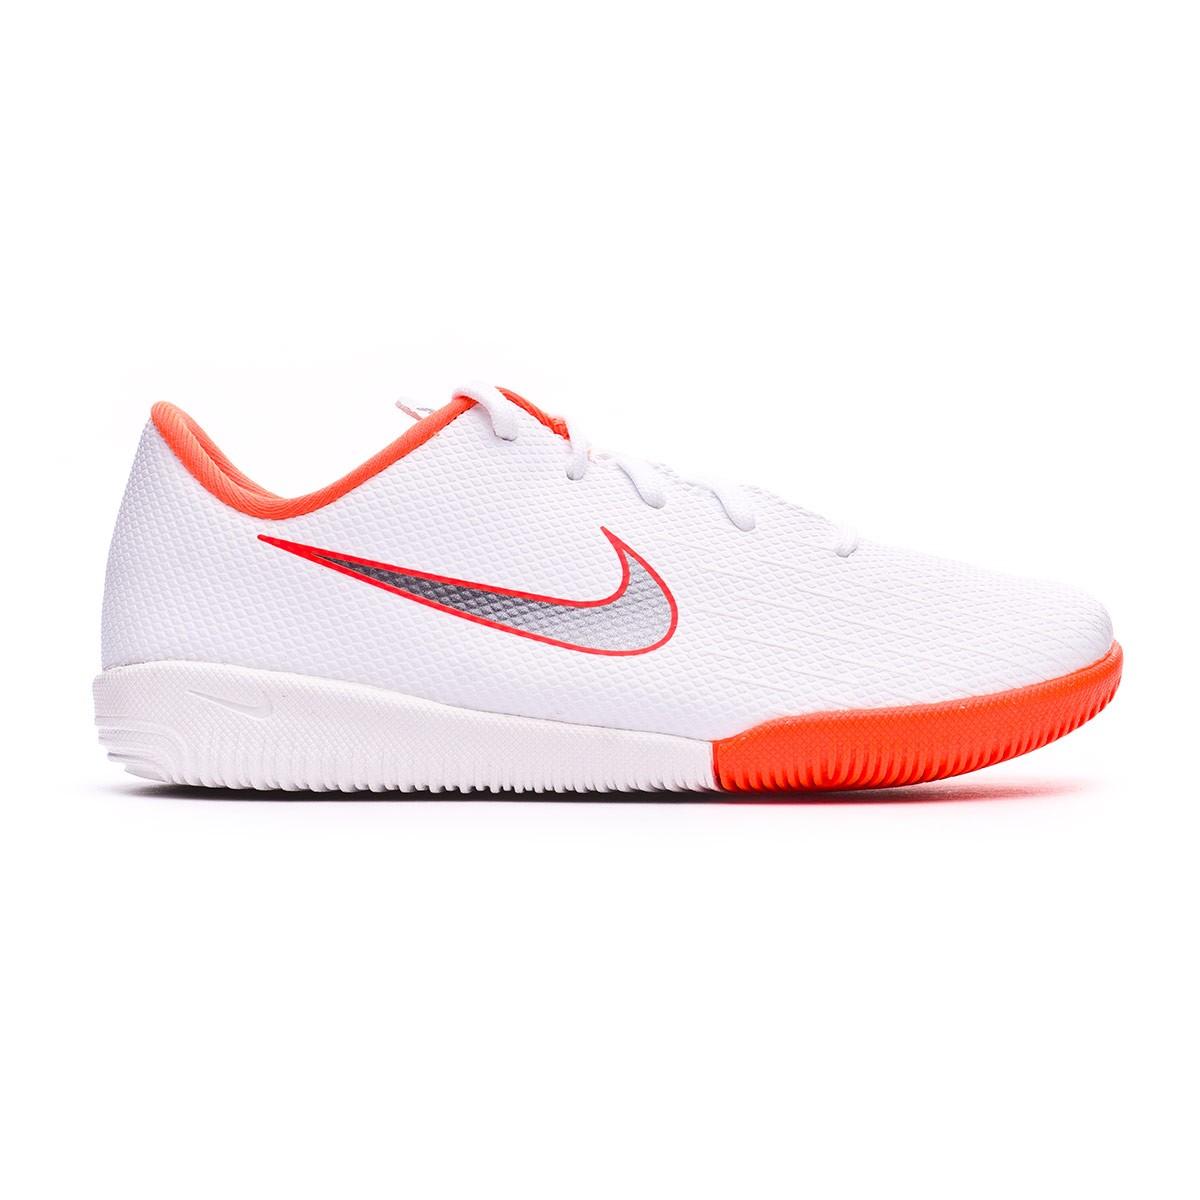 fe9e5eb8a41 Futsal Boot Nike Kids Mercurial VaporX XII Academy PS IC White-Metallic  cool grey-Total orange - Football store Fútbol Emotion